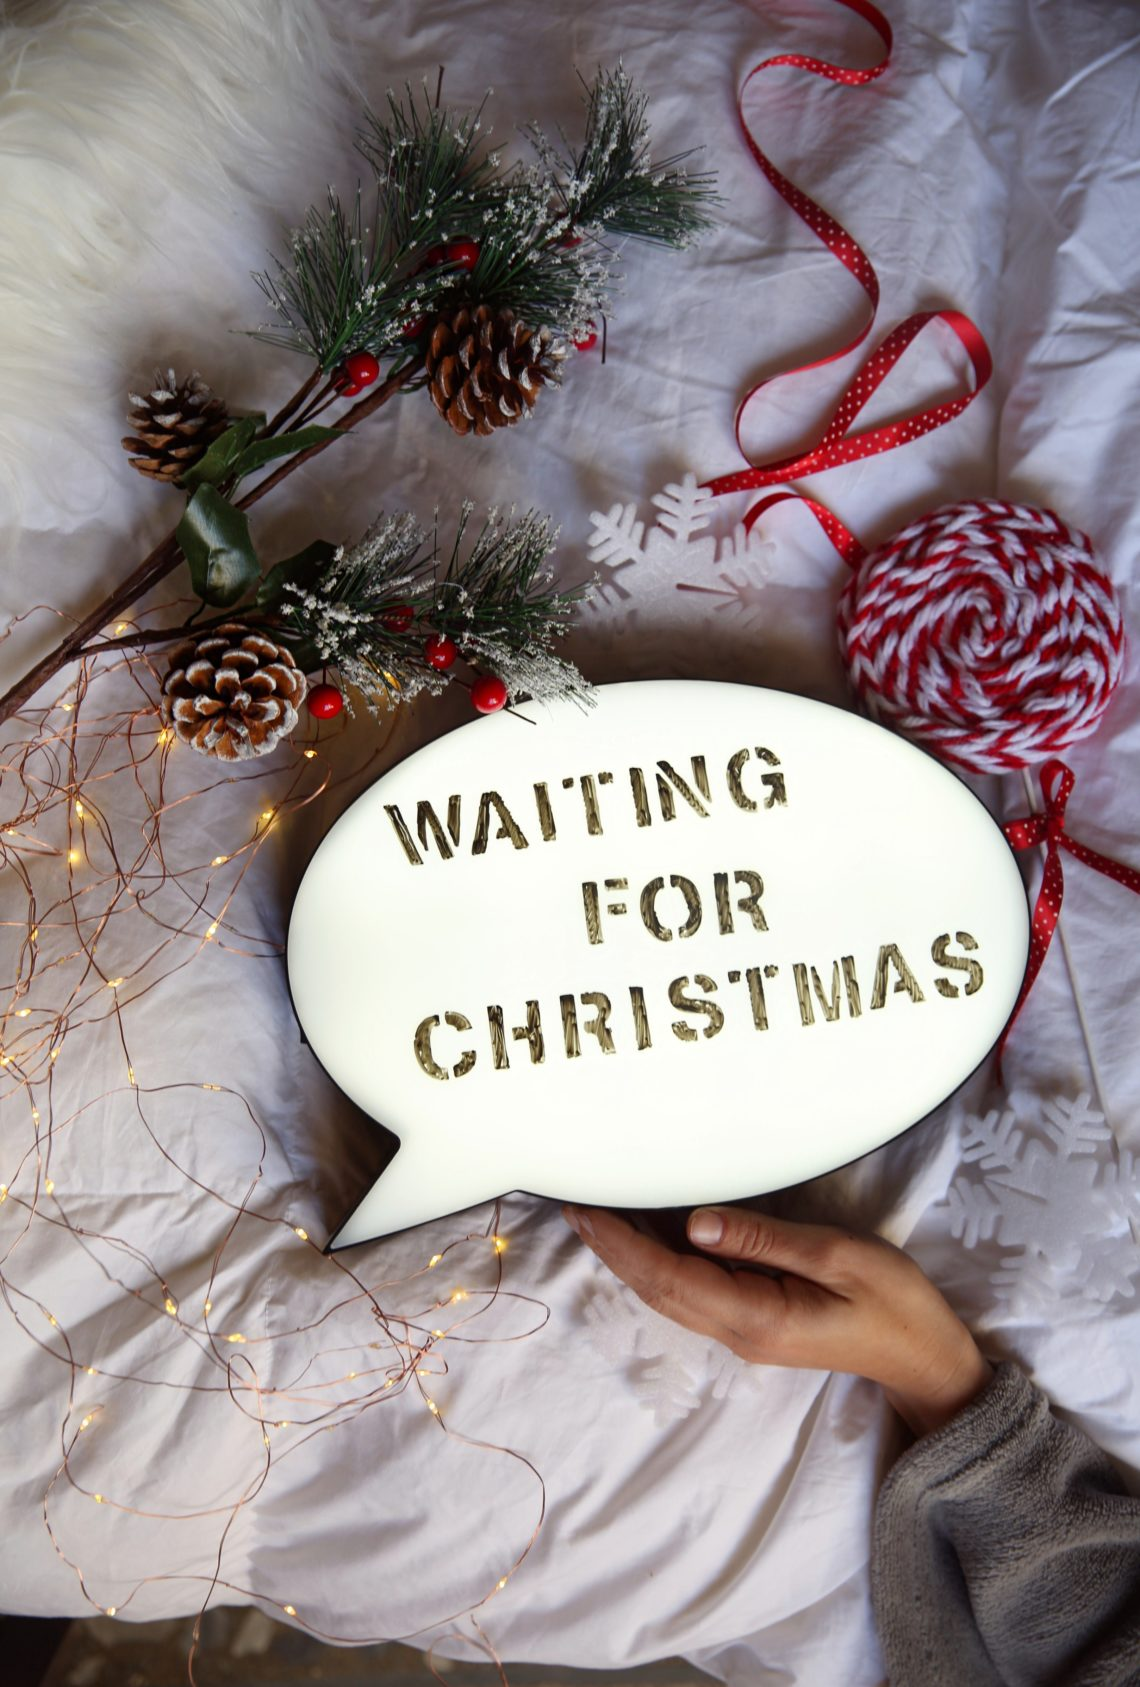 Regali Di Natale Per I Suoceri.Auguri Di Natale Ai Suoceri